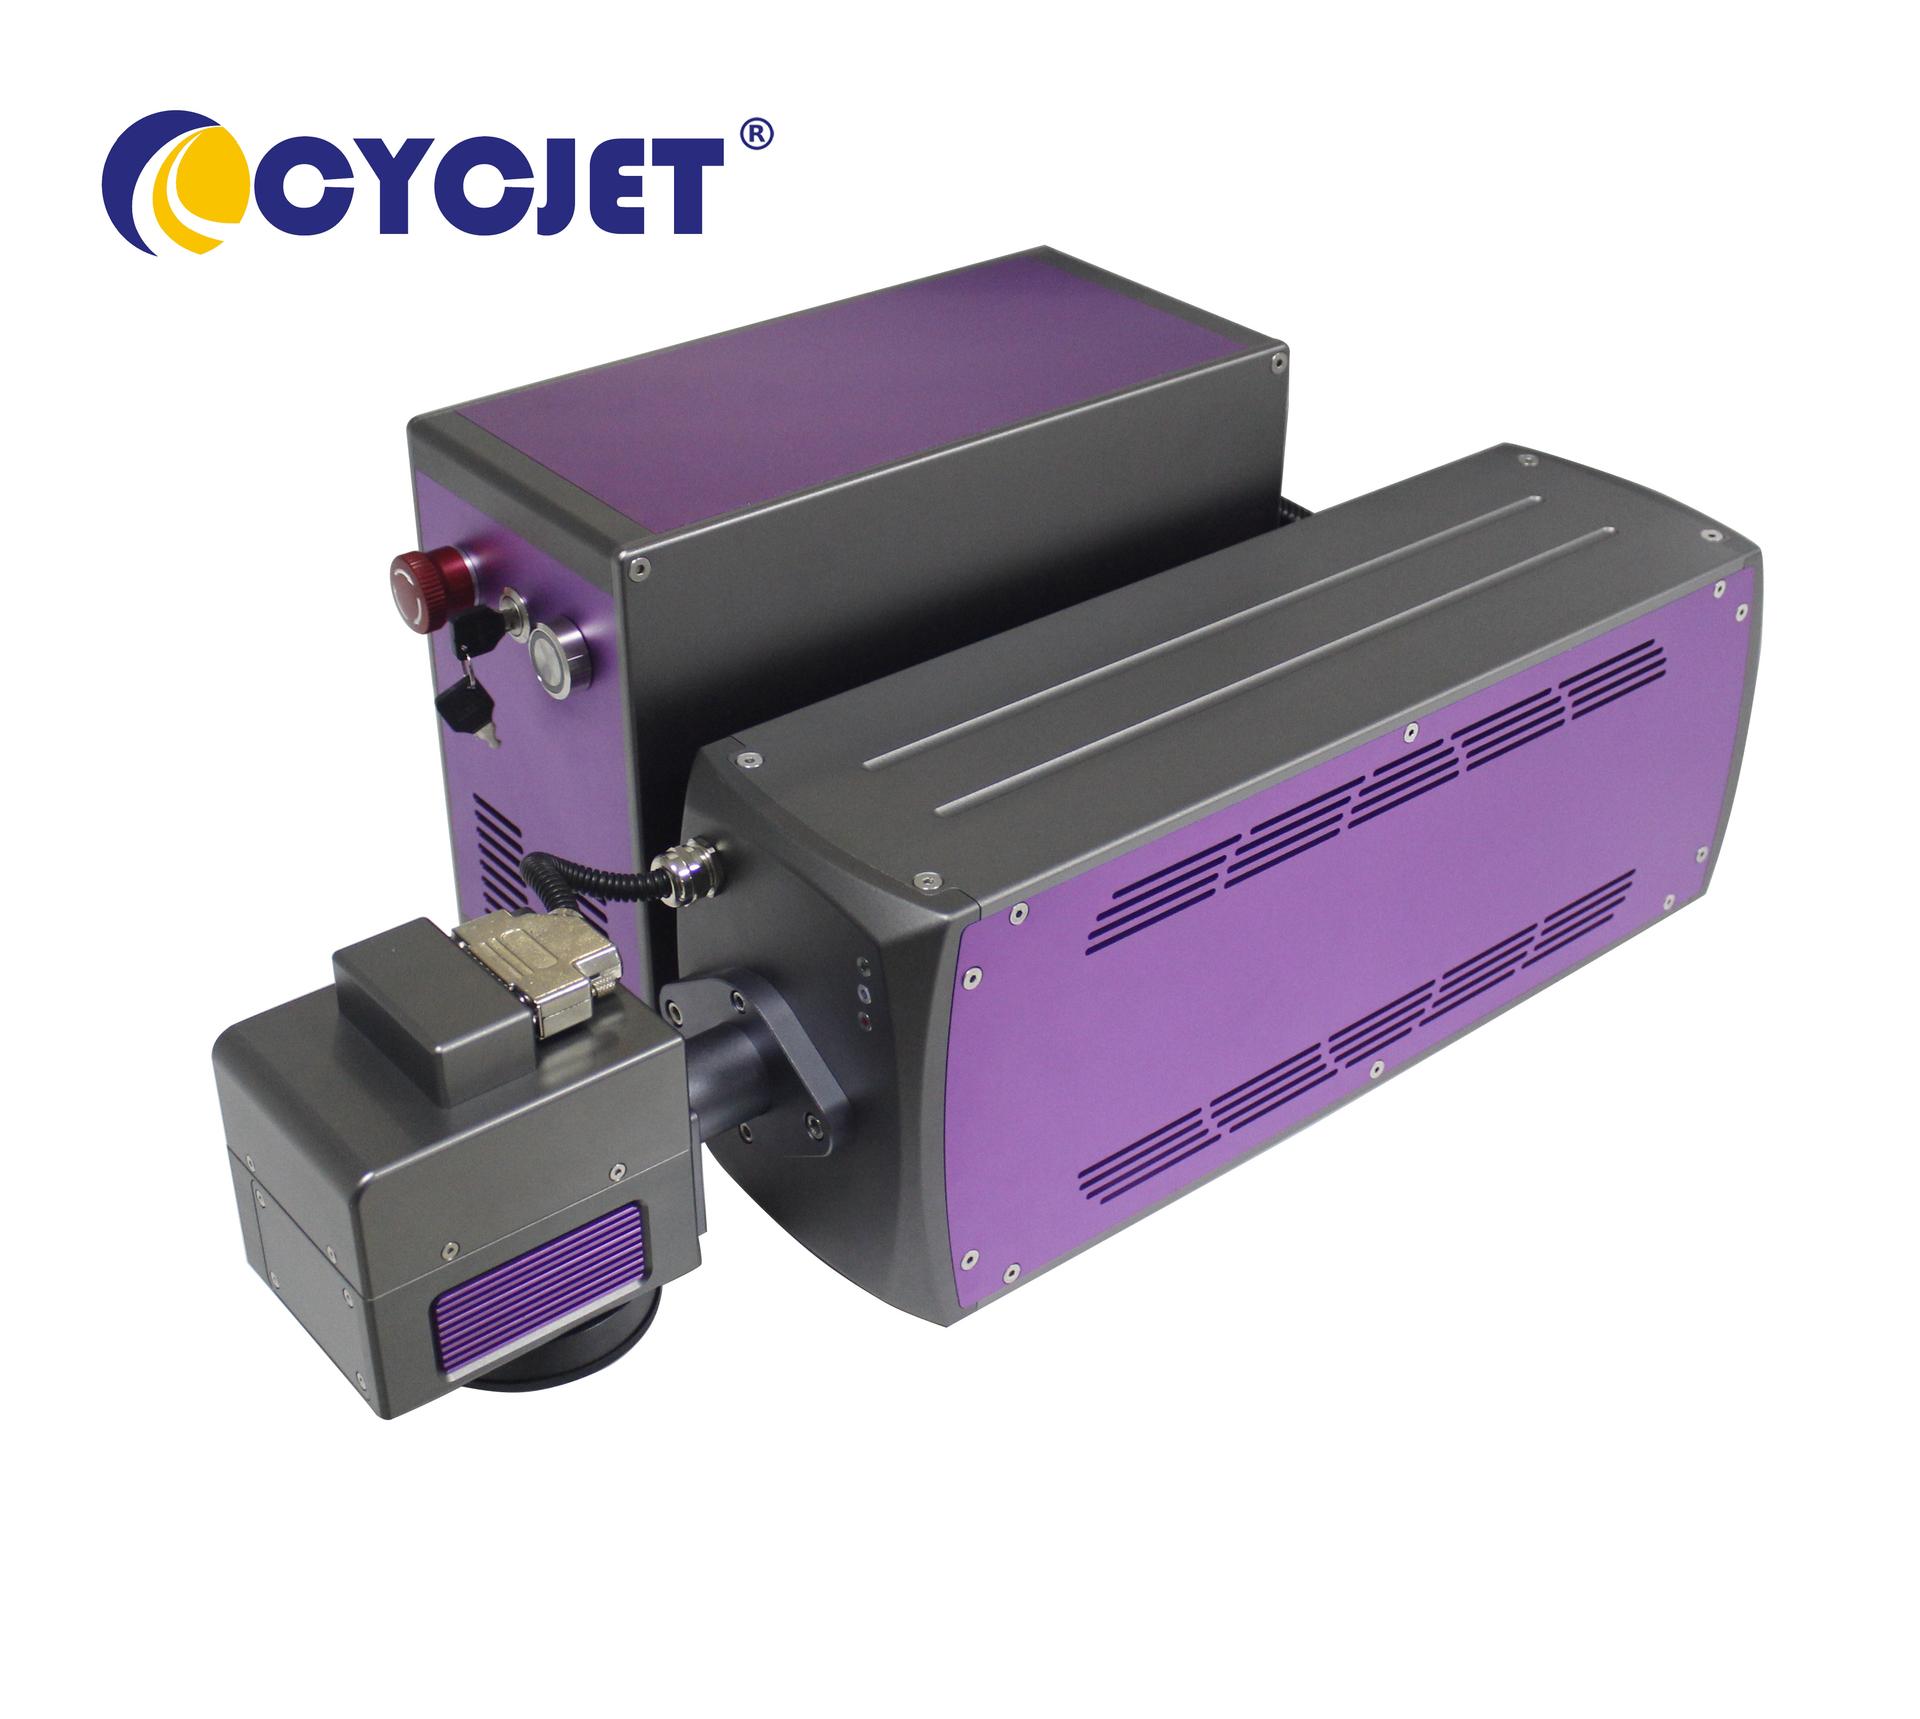 CYCJET Fly Laser Printer